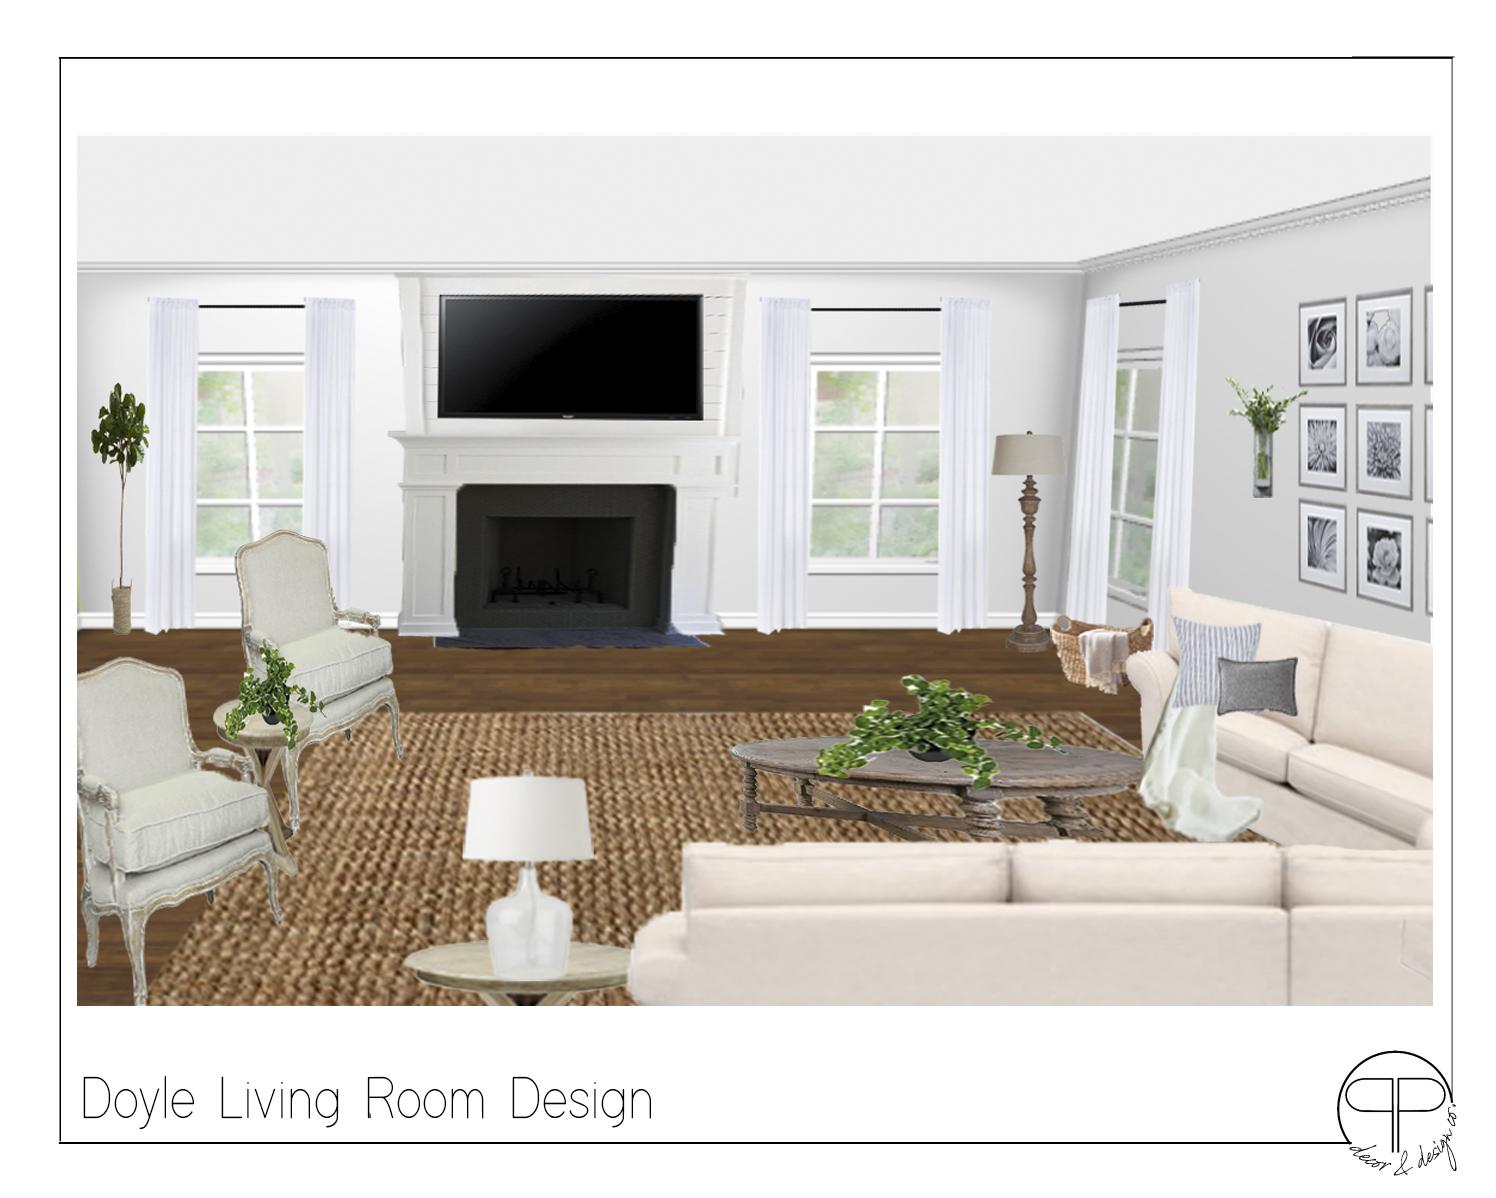 Doyle_Living_Room_Design_View_2.jpg